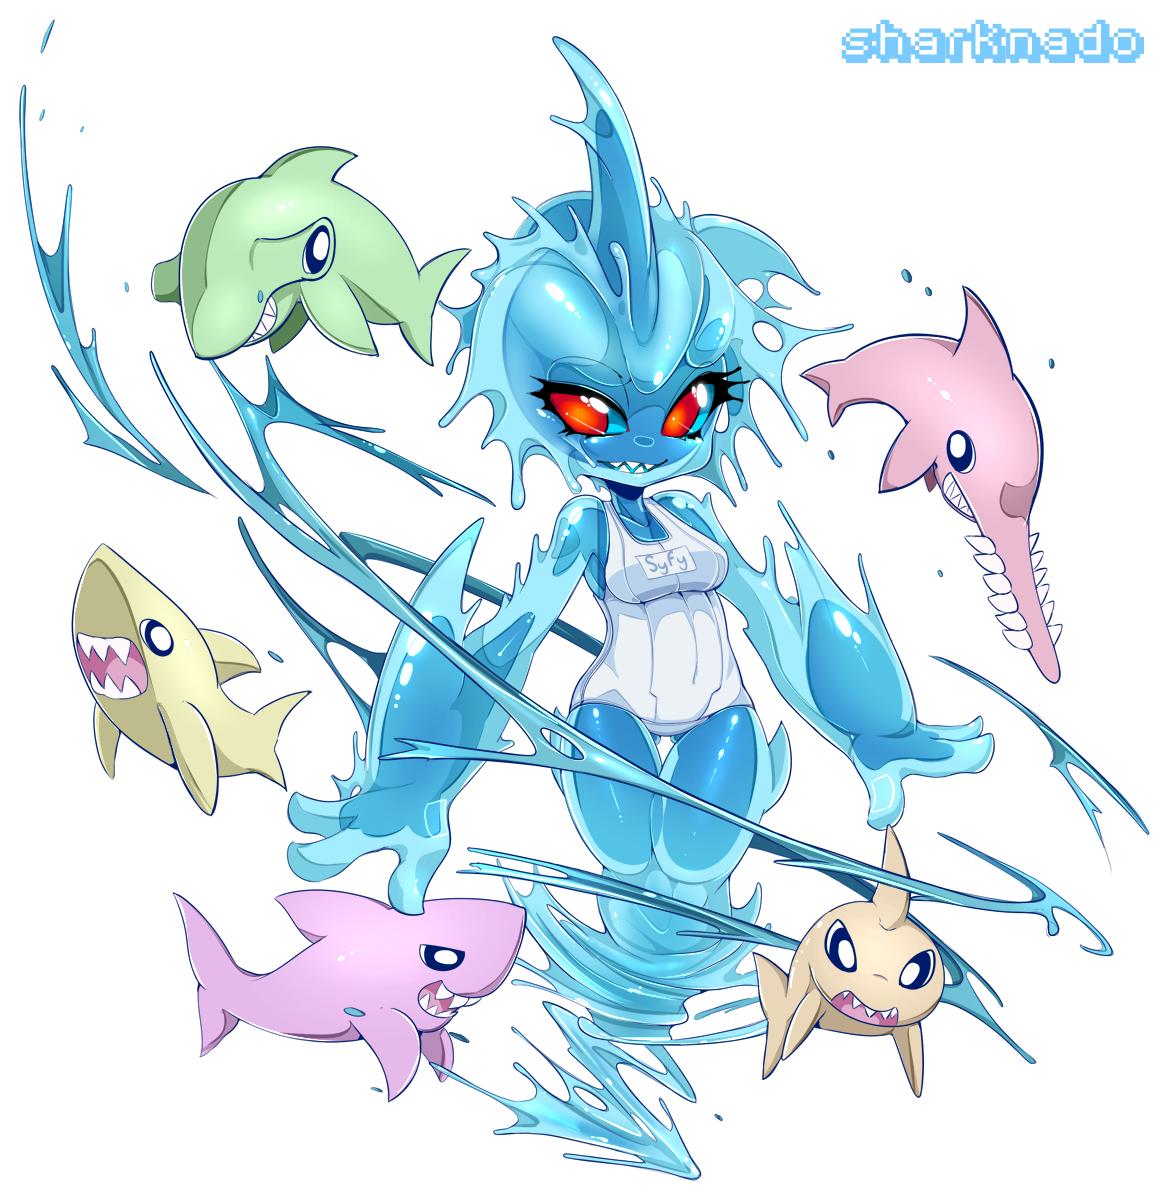 Syfy Sharks - Sharknado by Slugbox